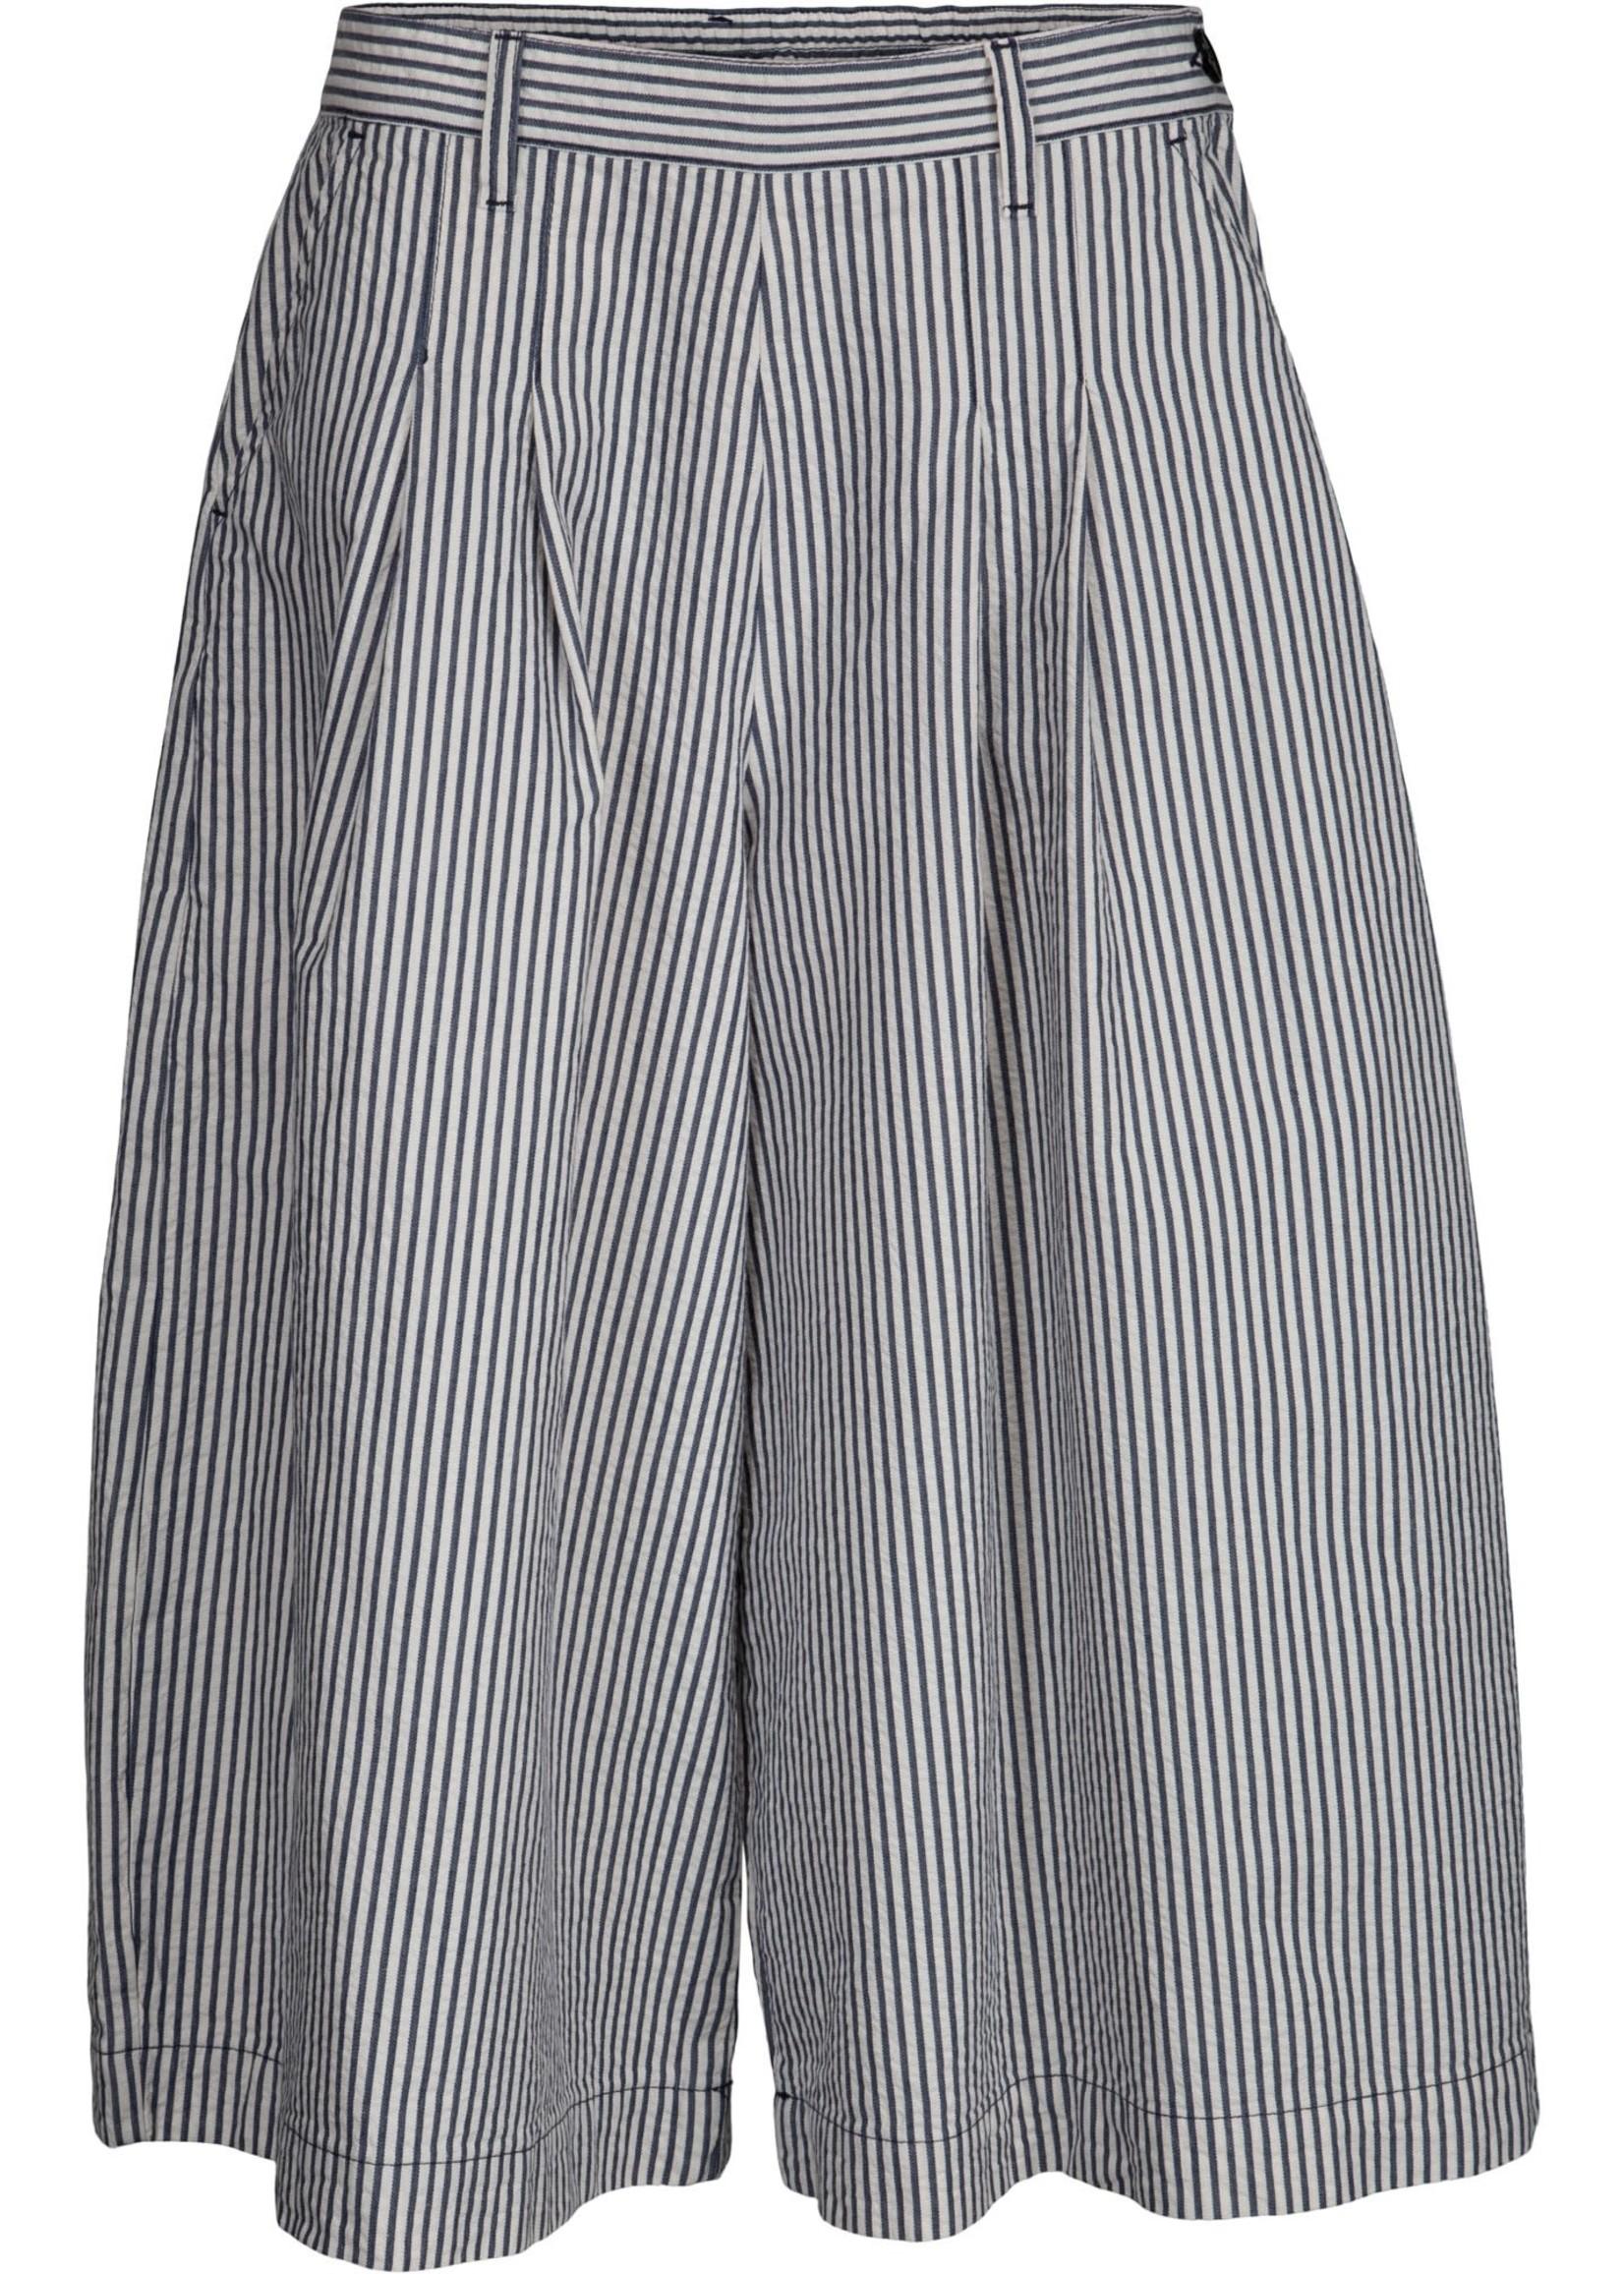 TWO DANES 36555 379 Thyme Cotton Culotte/Pant